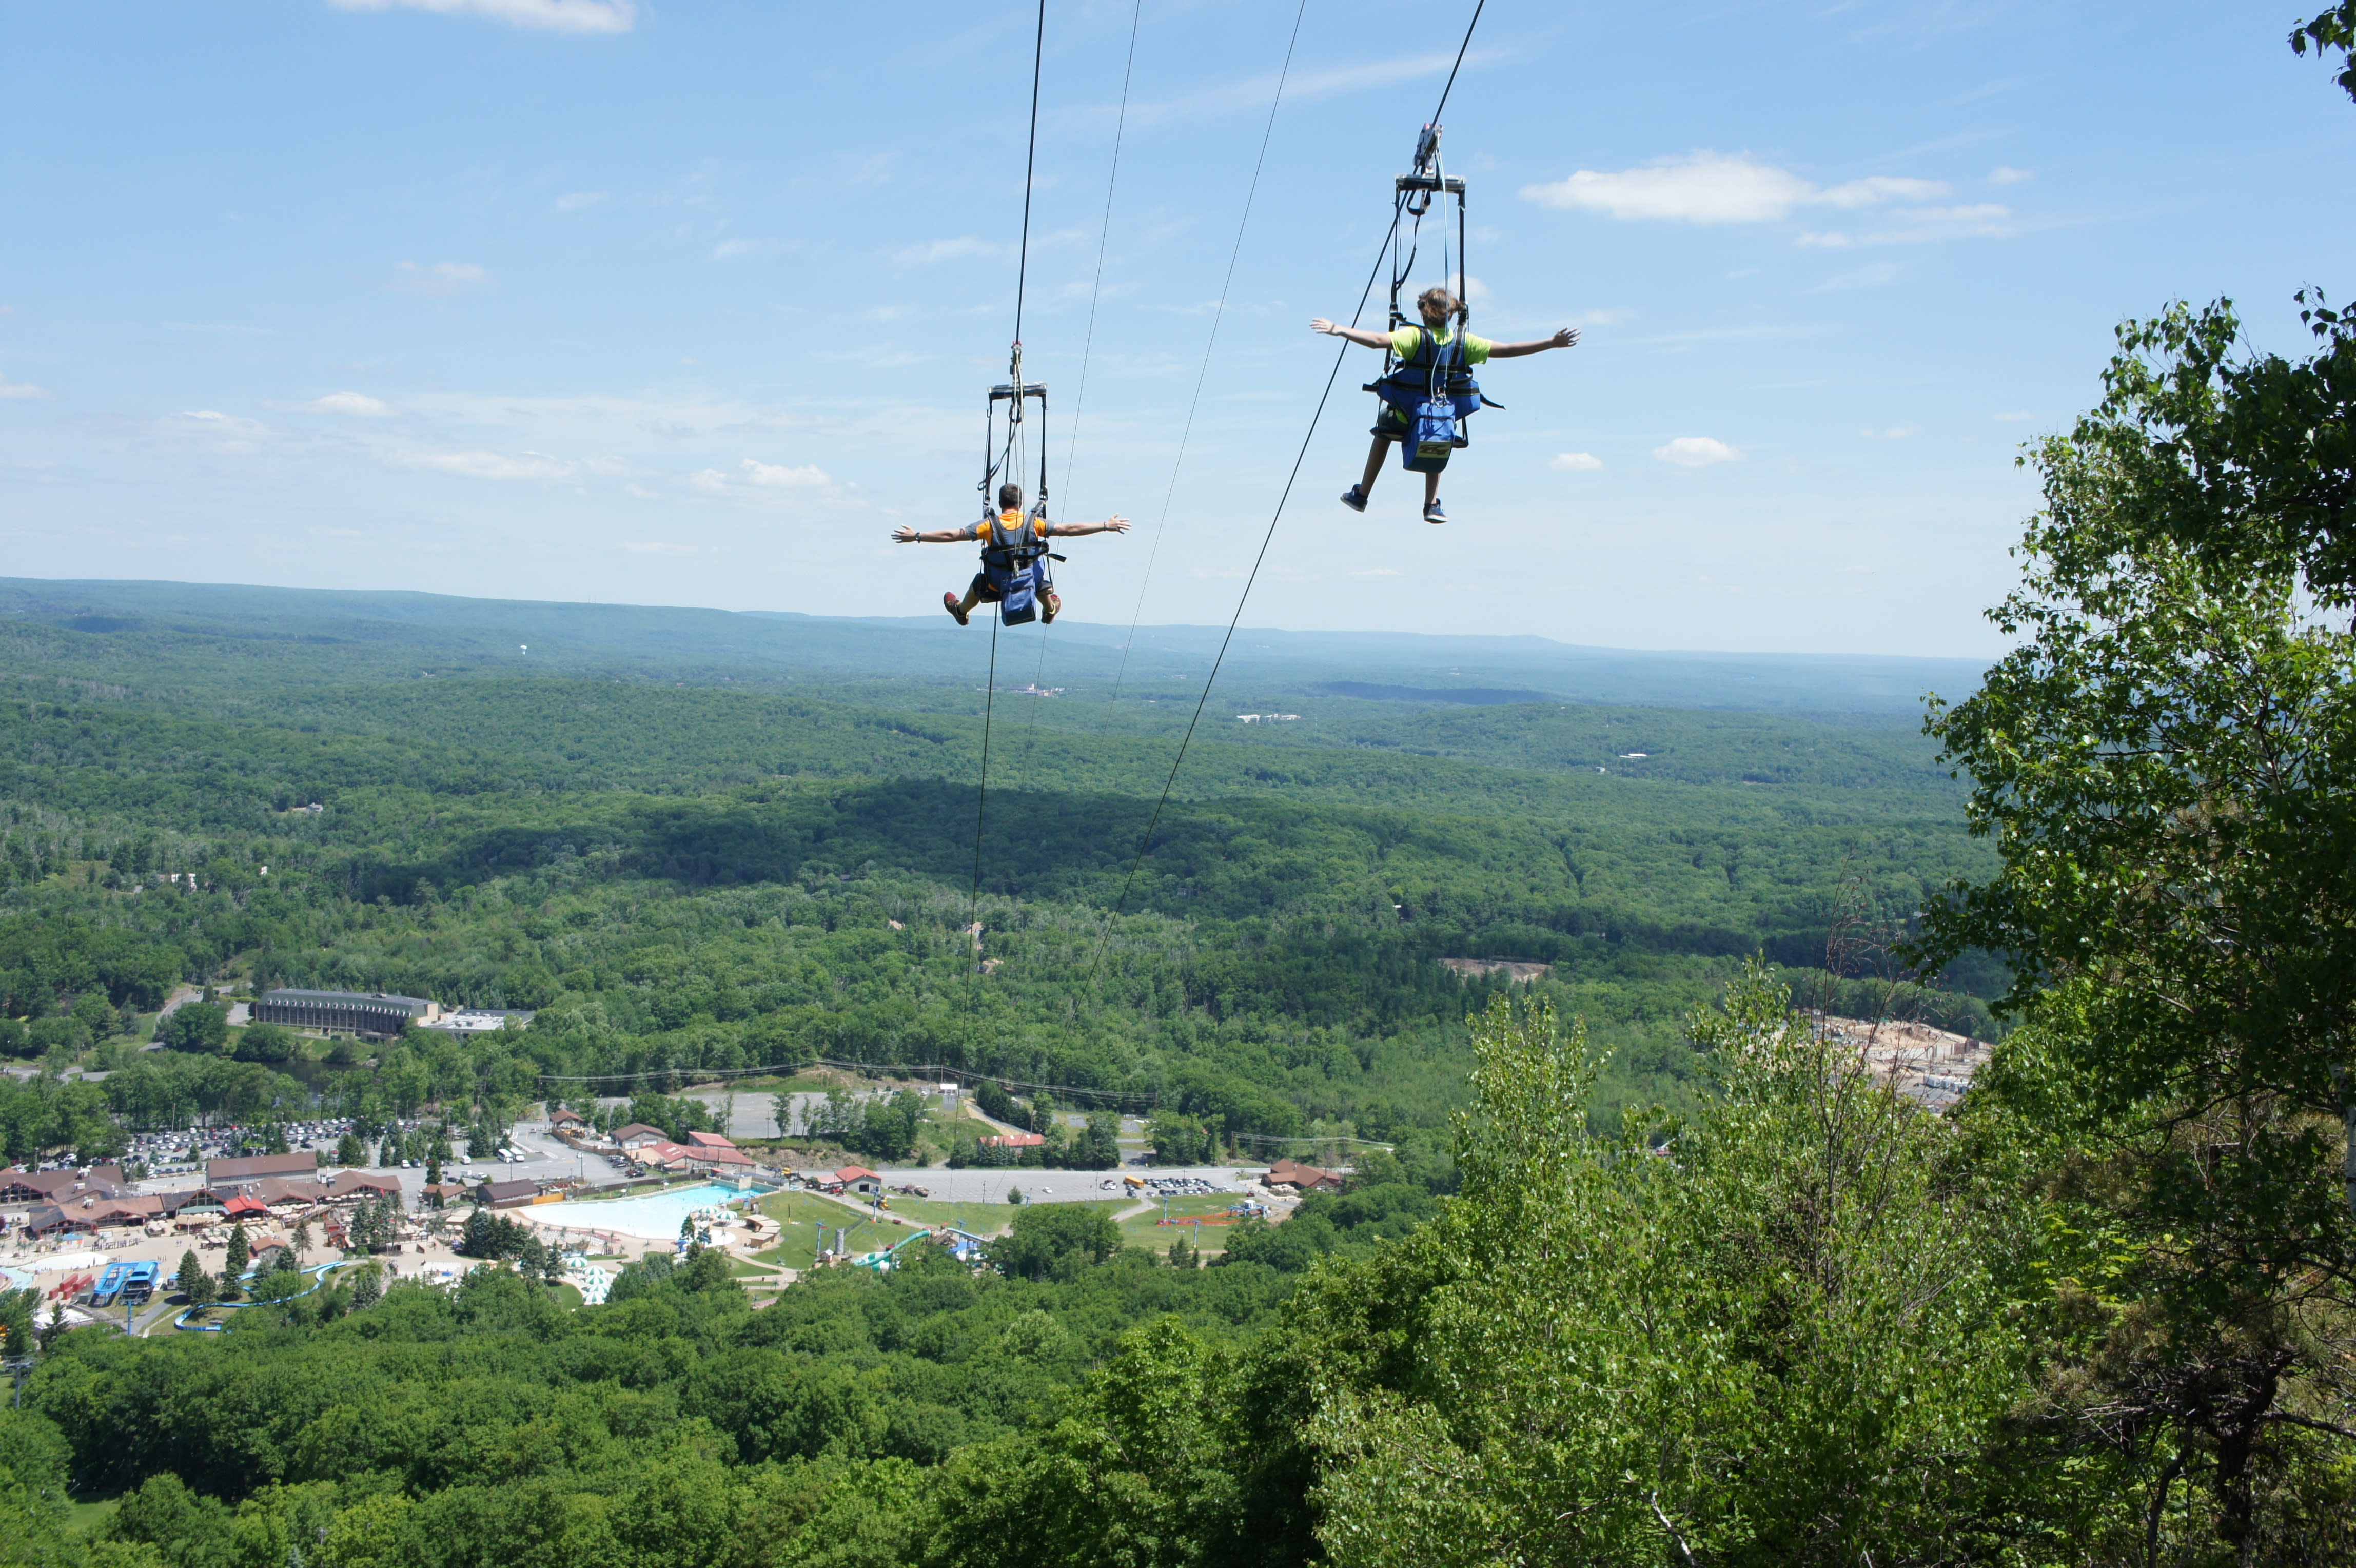 Zip Line Fun in the Pocono Mountains